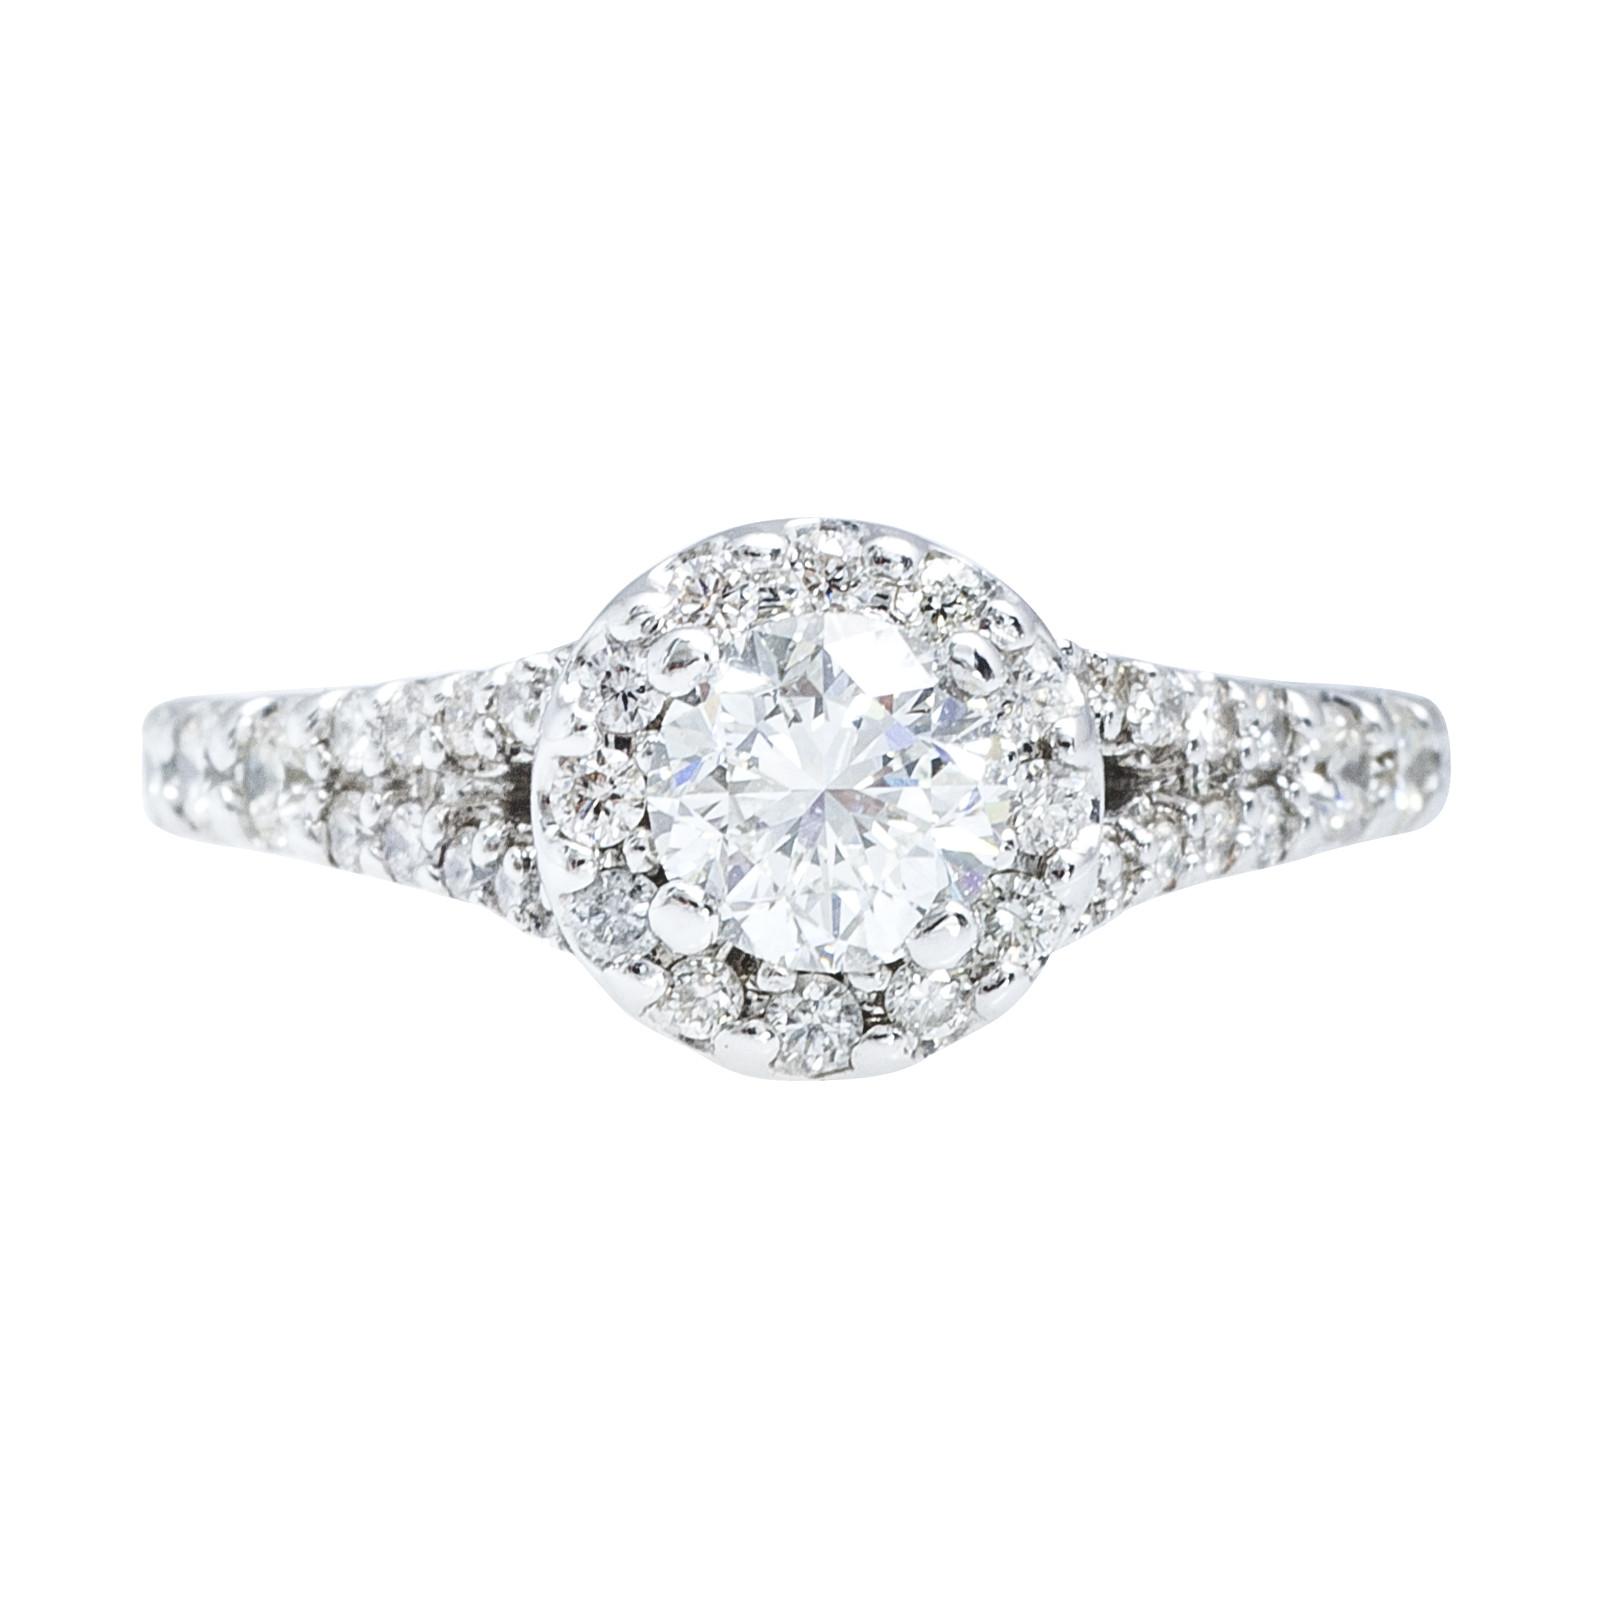 Vintage 1.04 CTW Diamond Engagement Ring